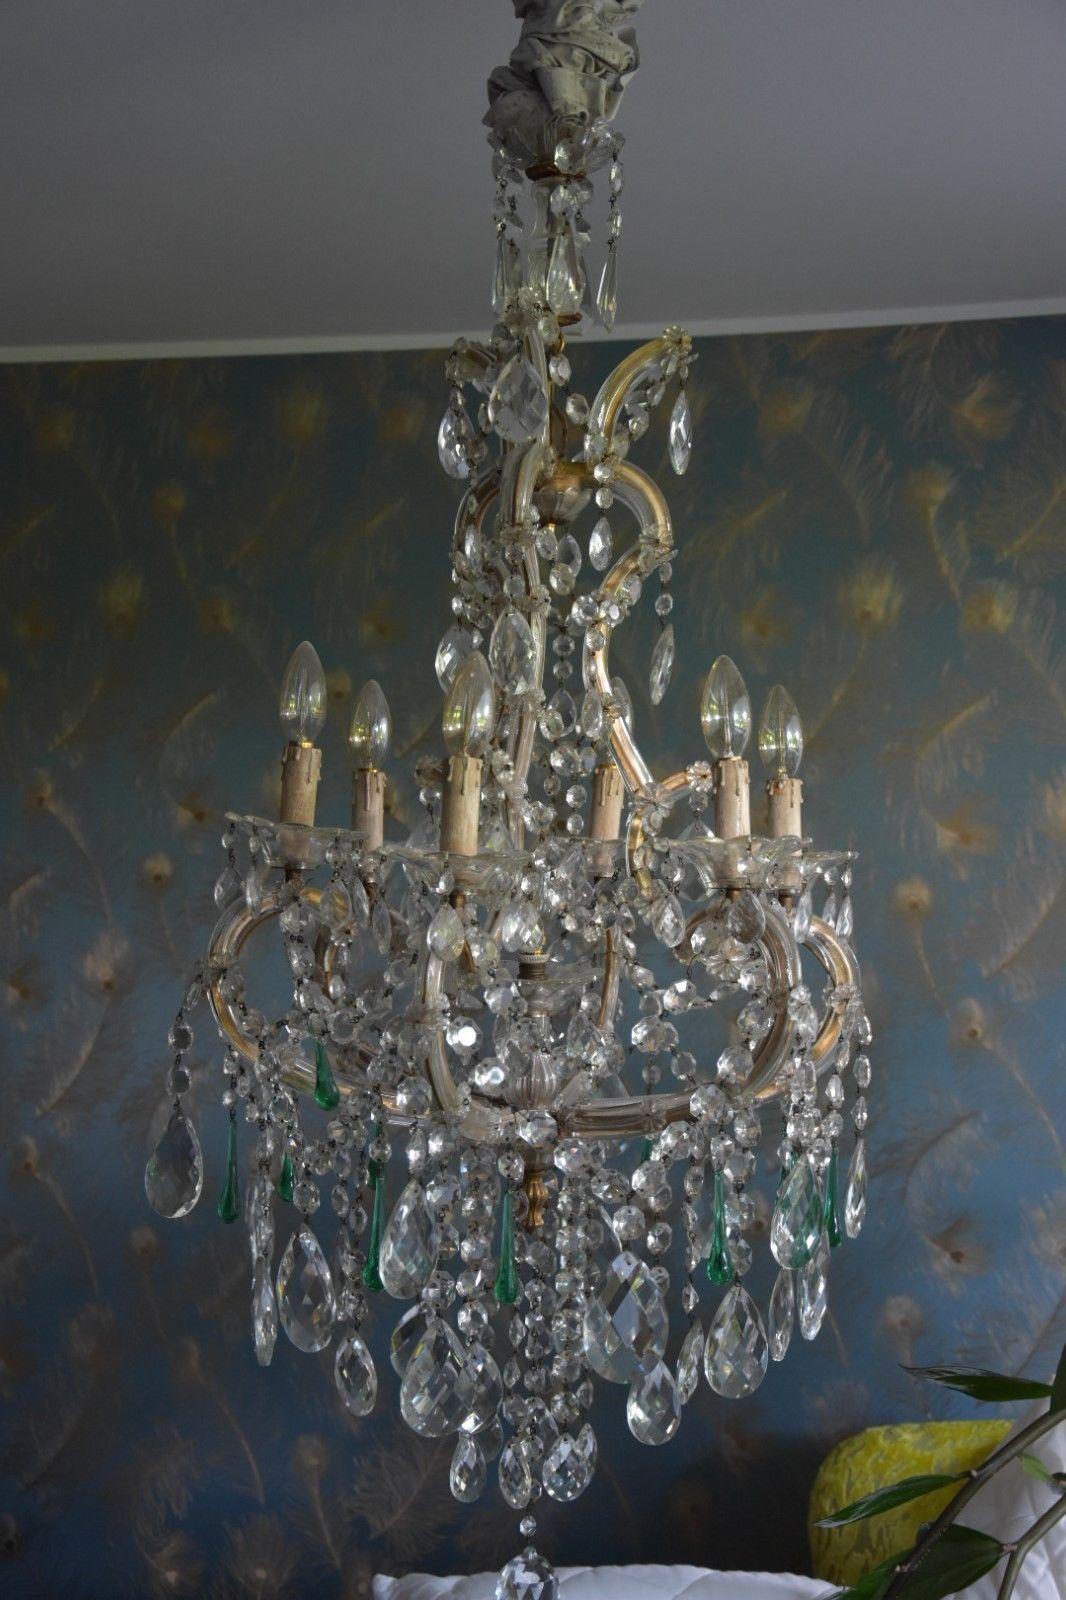 Antiker Wiener Kristall LÜster Kronleuchter Lampe Ebay Chandelier Ceiling Lights Light